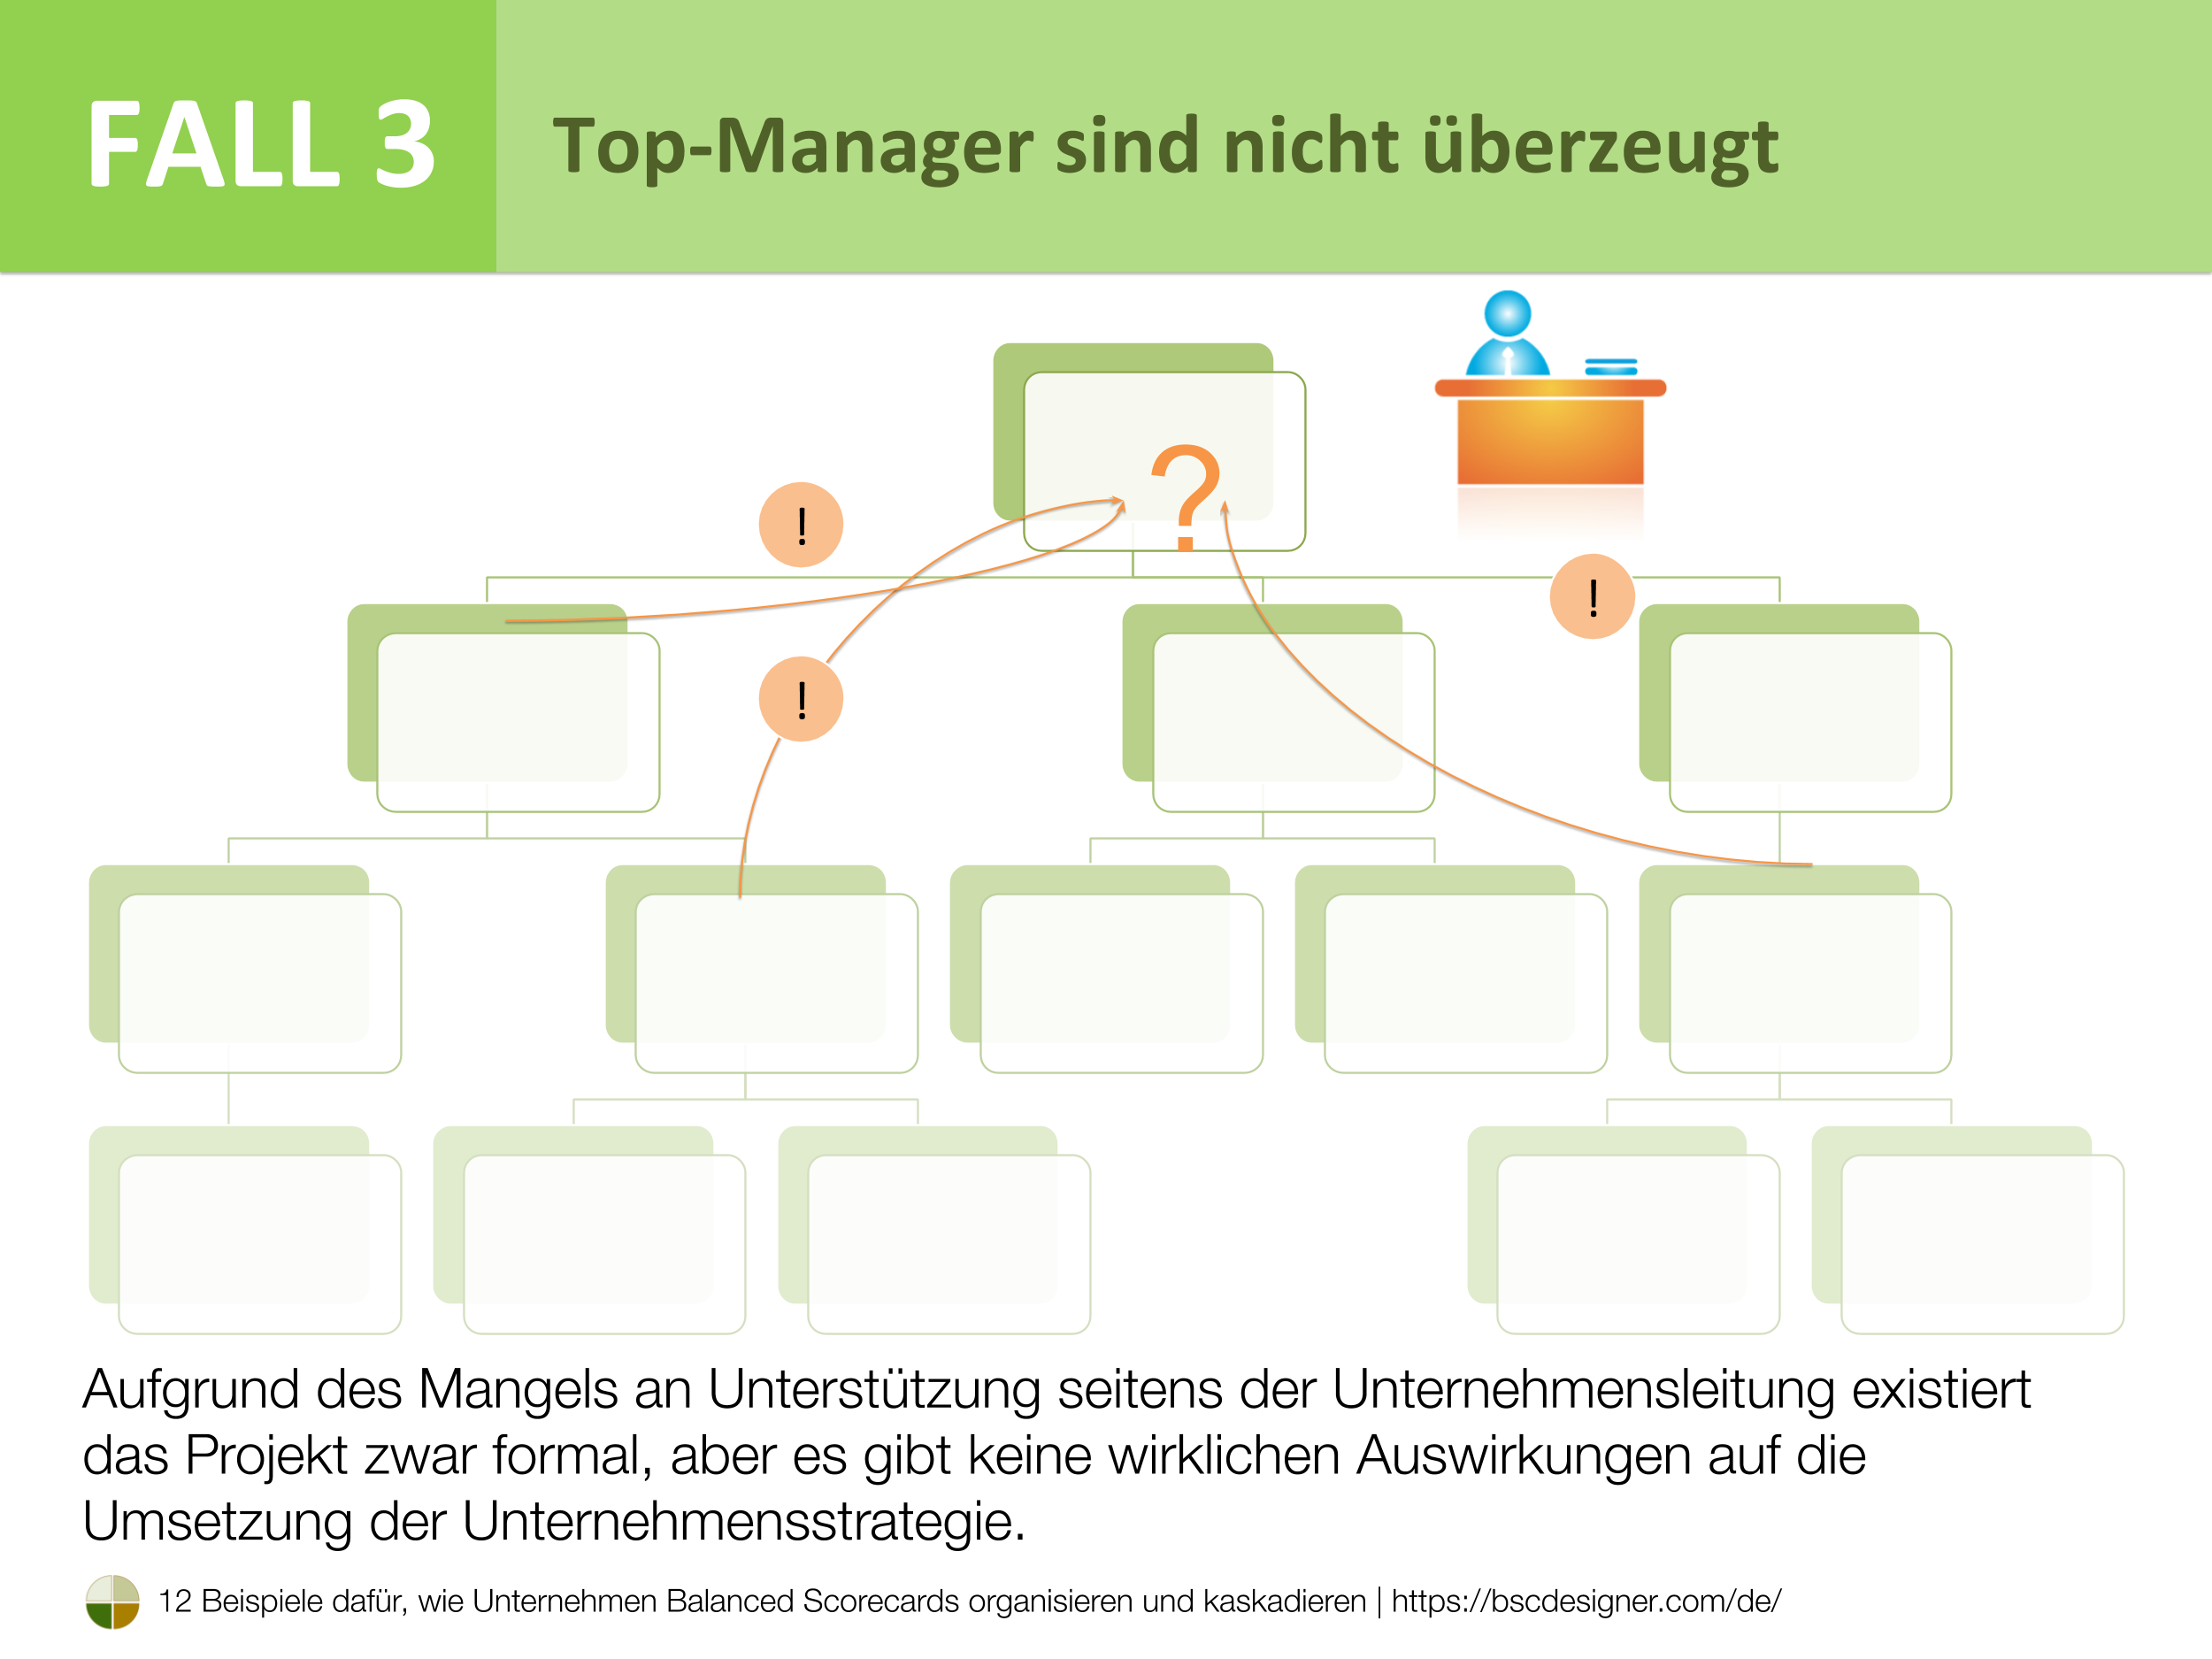 Fall 3 - Top-Manager sind nicht überzeugt